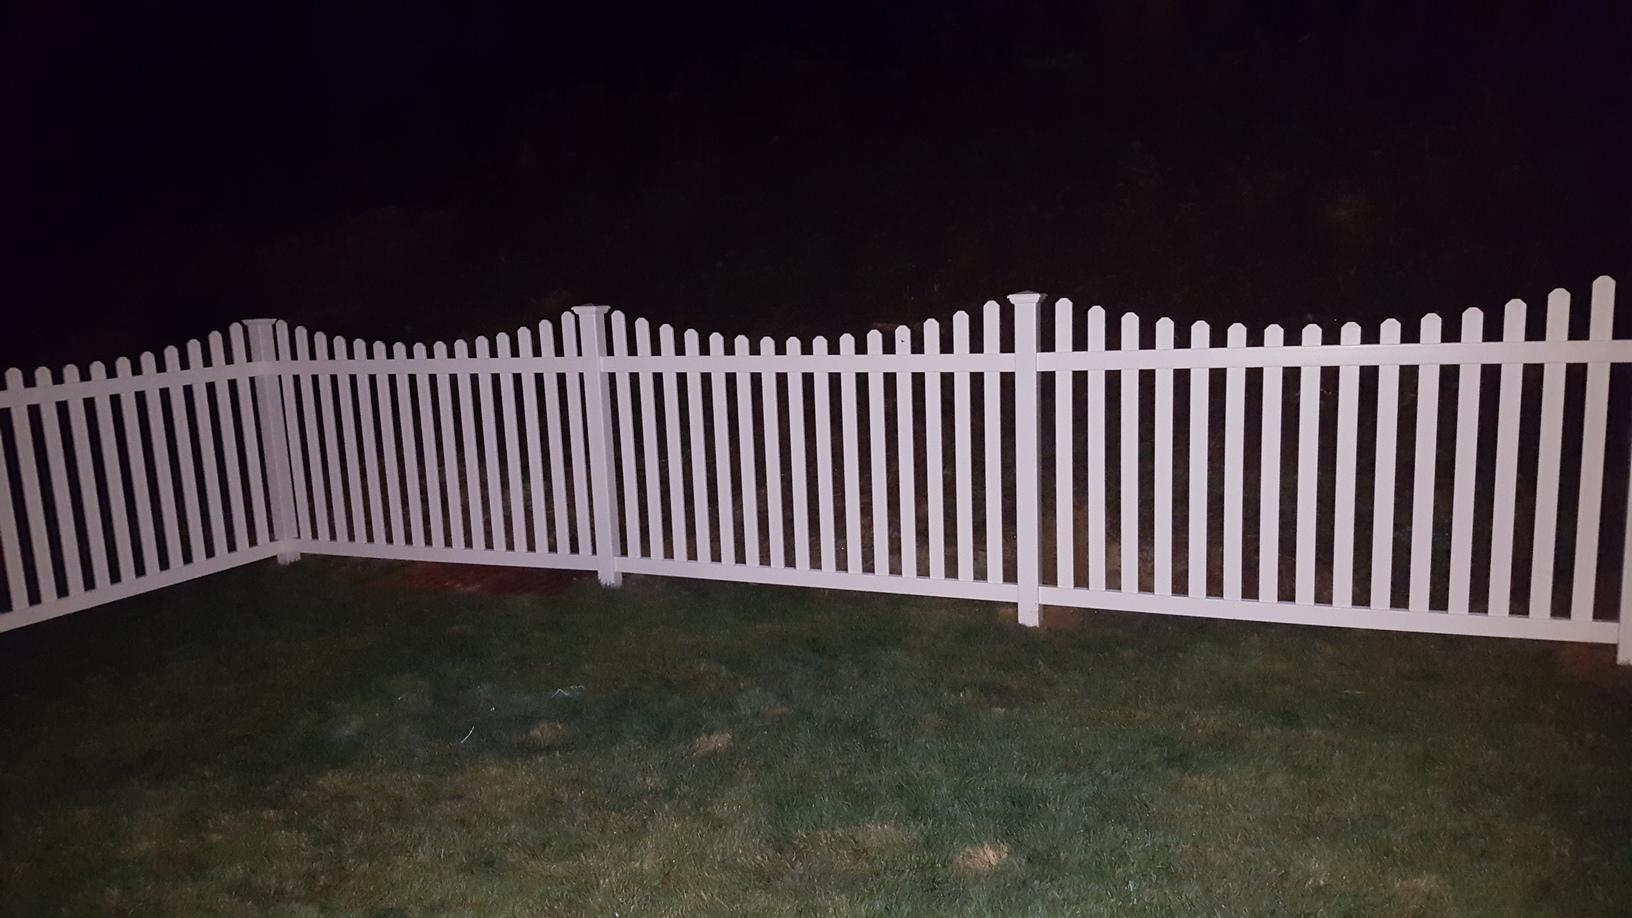 Monroeville Fencing